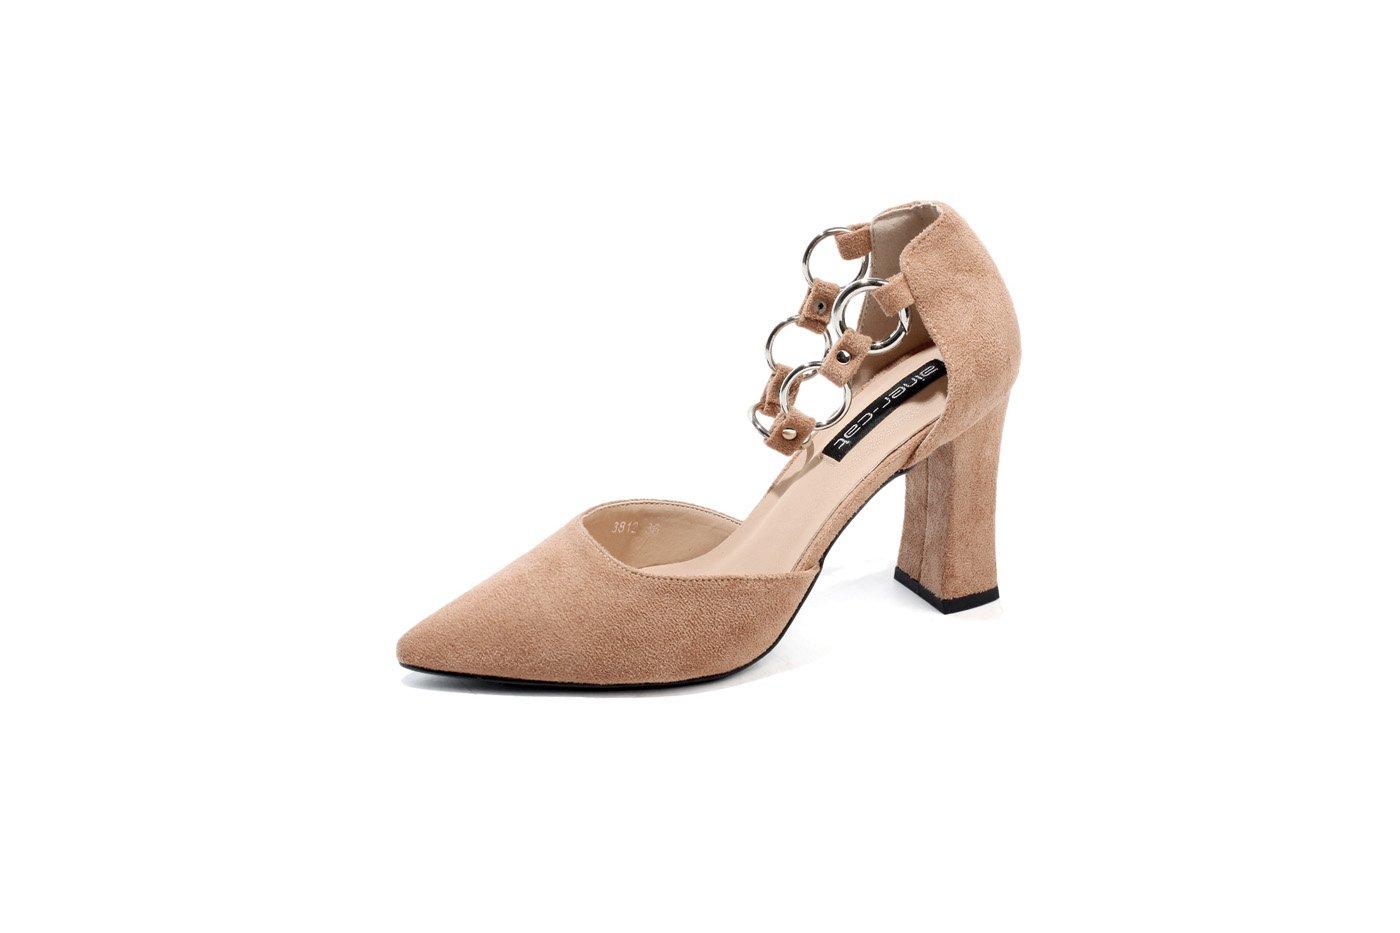 DANDANJIE damen damen damen schuhe Sommer Schnalle Knöchelriemen High Stöckelabsatz Spitze Suede-PU Court Schuhe (Farbe   Khaki, Größe   38) 09088f